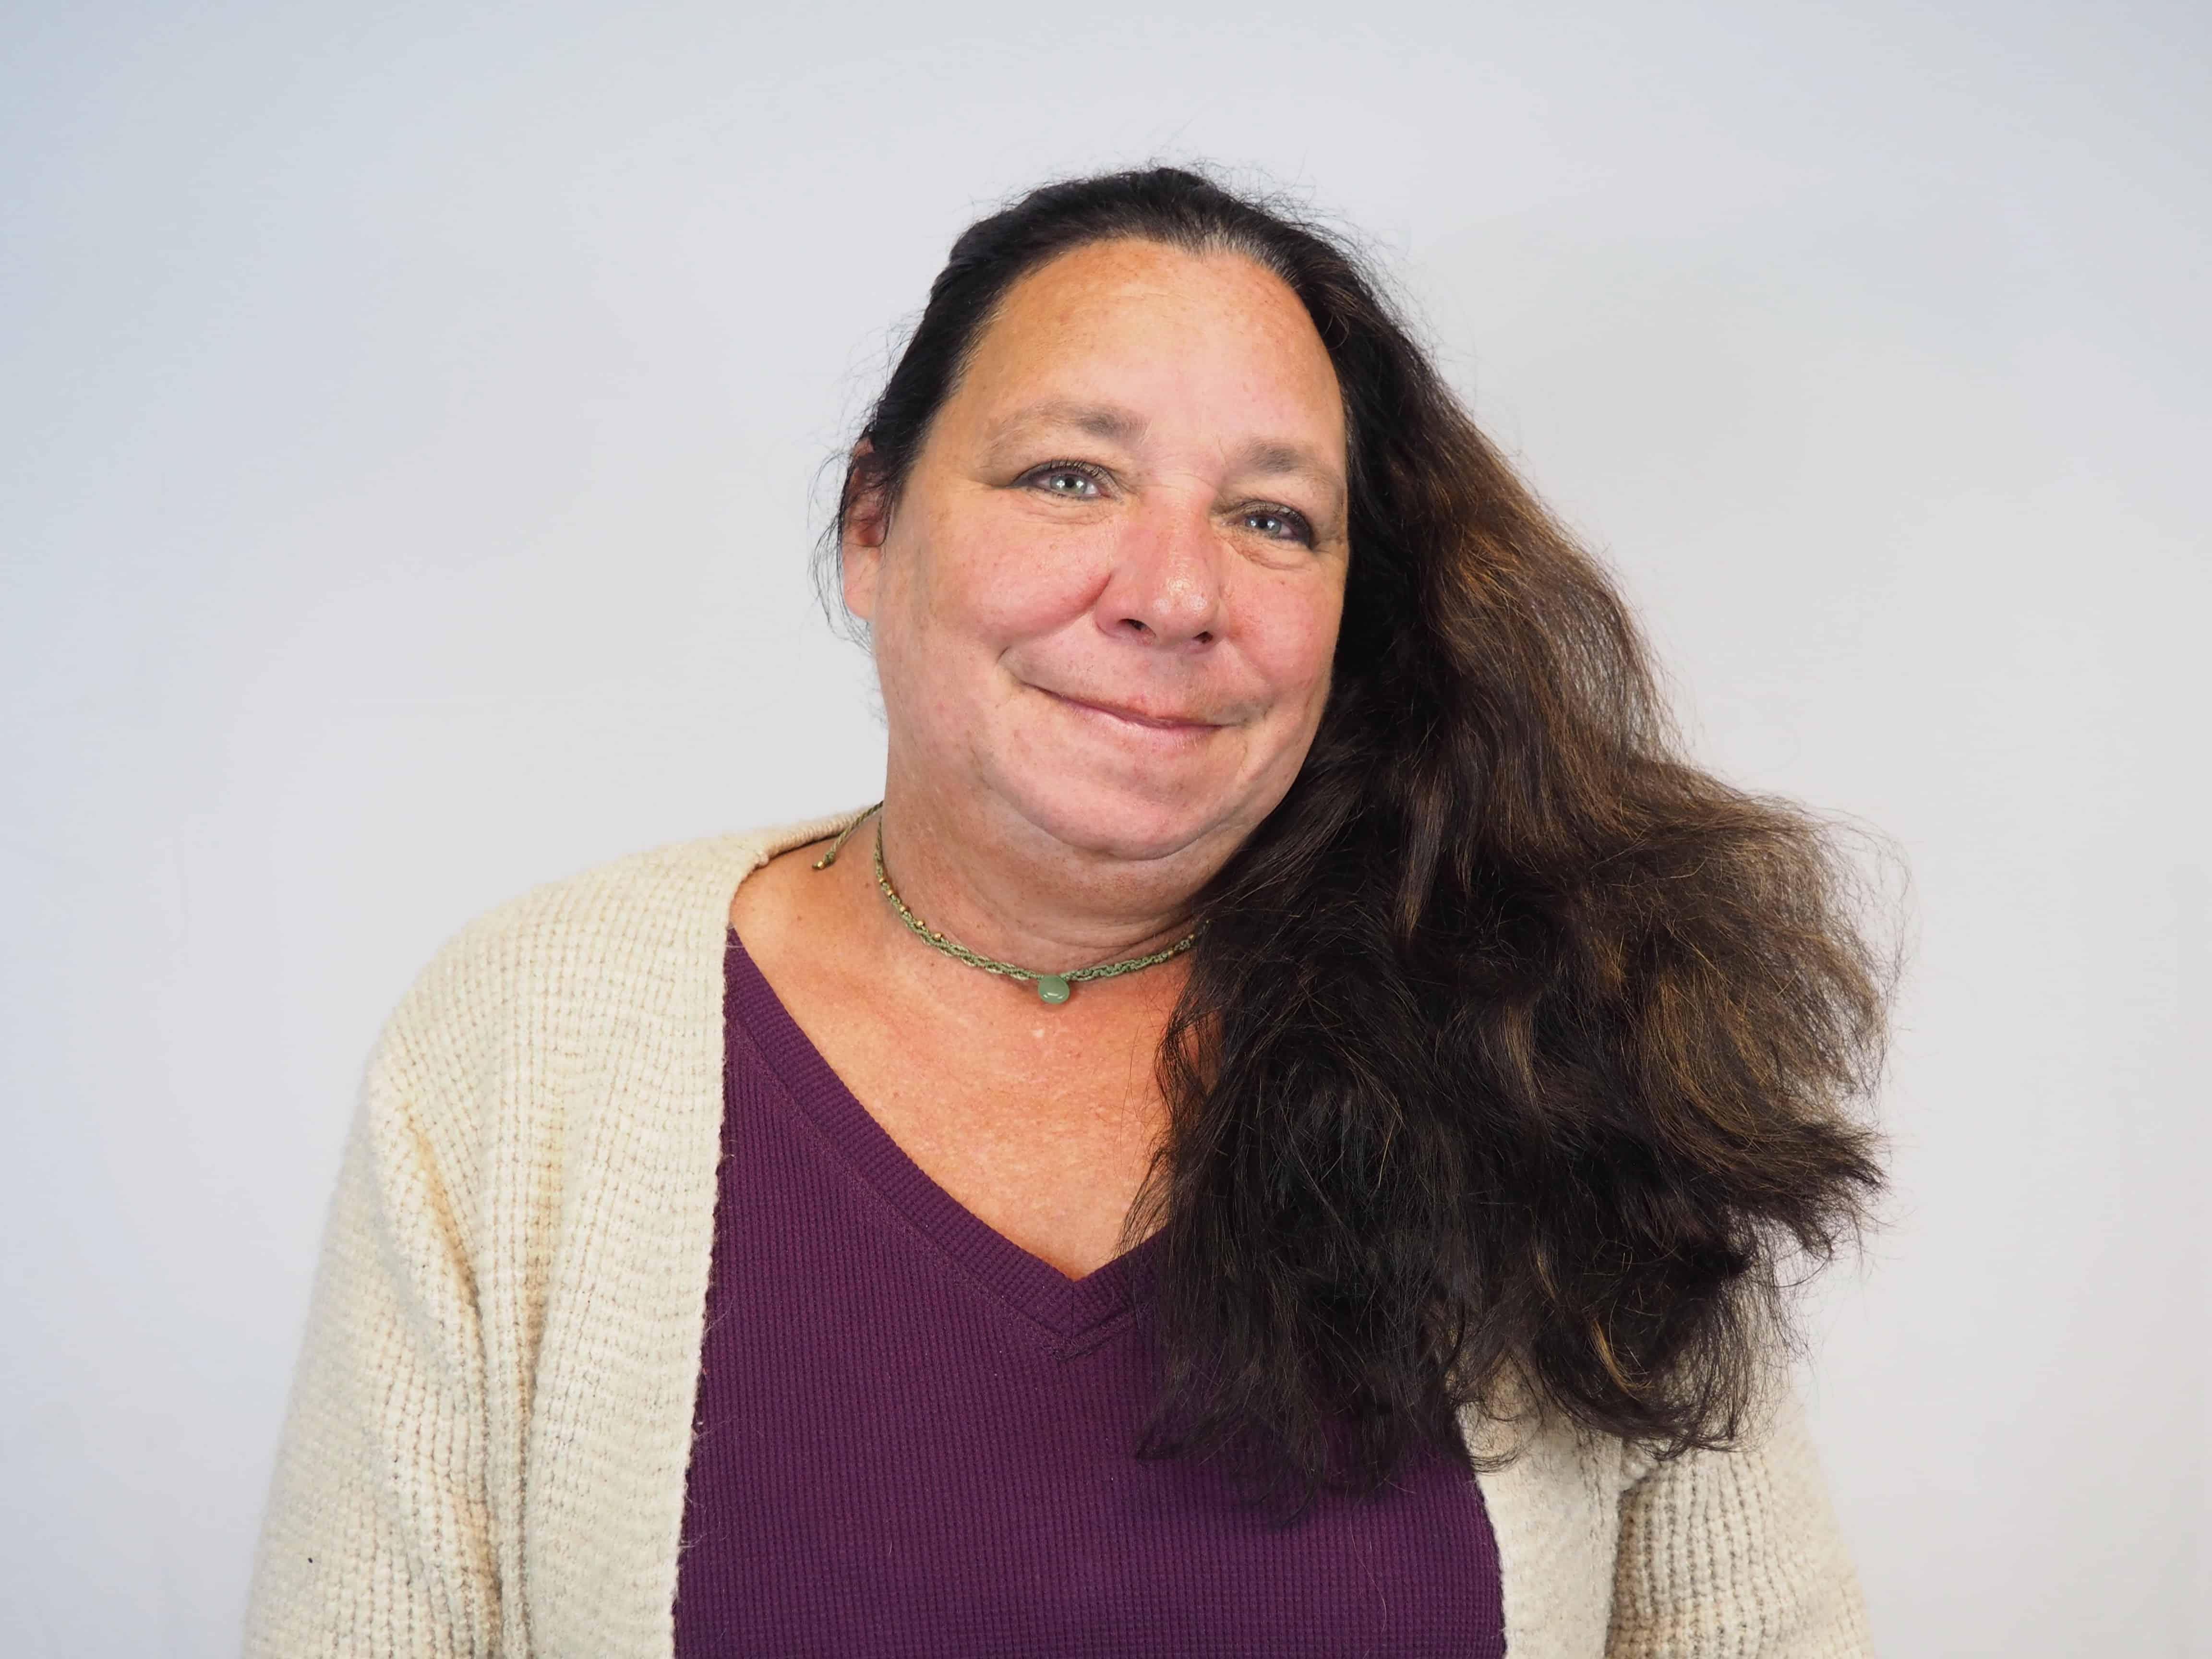 Laura Trombetta, Operations Manager